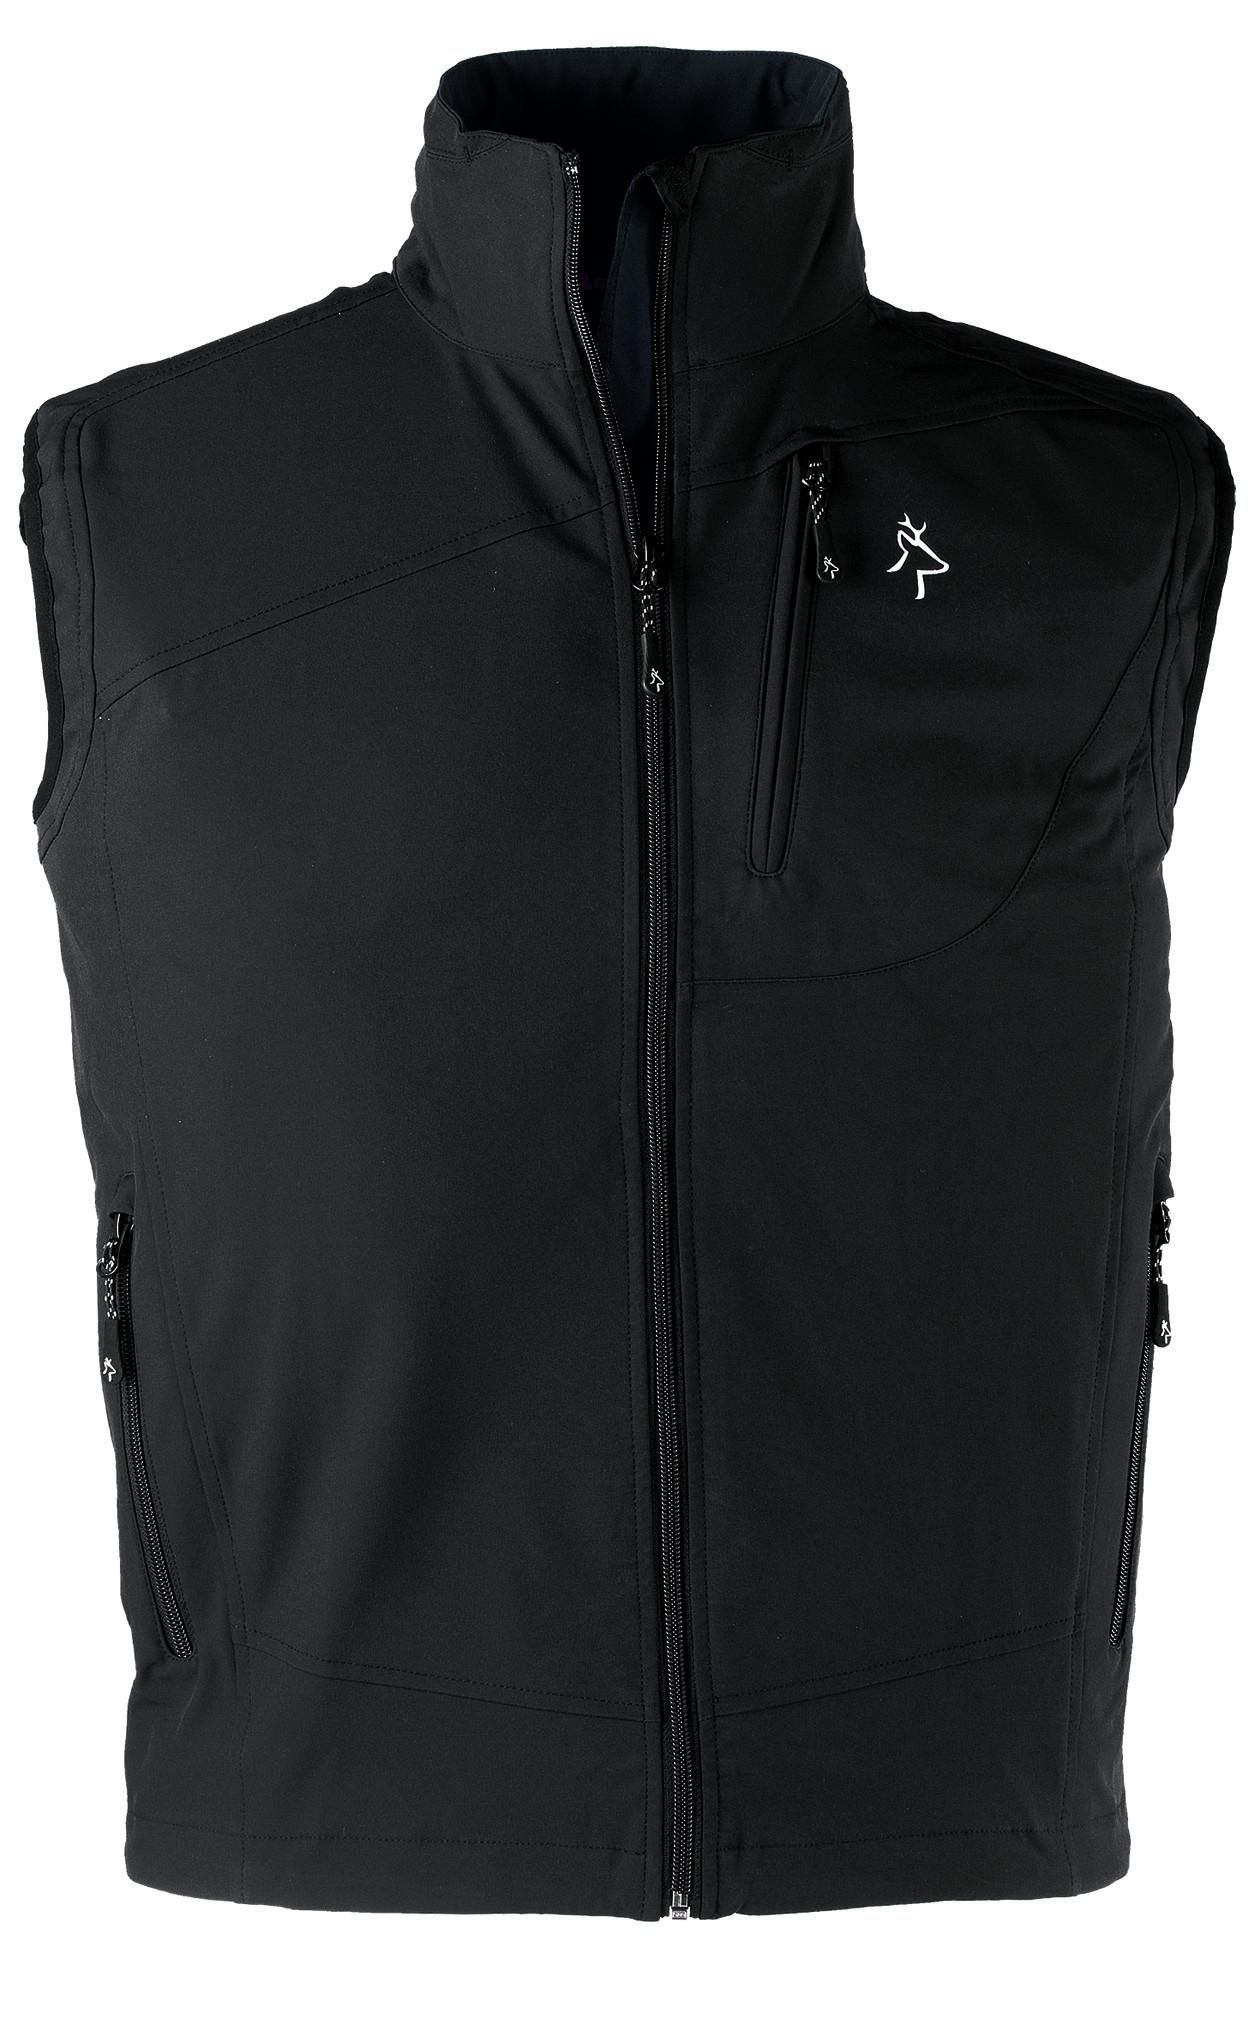 Pracovní softshellová vesta KAPRIOL TECH černá - O203891